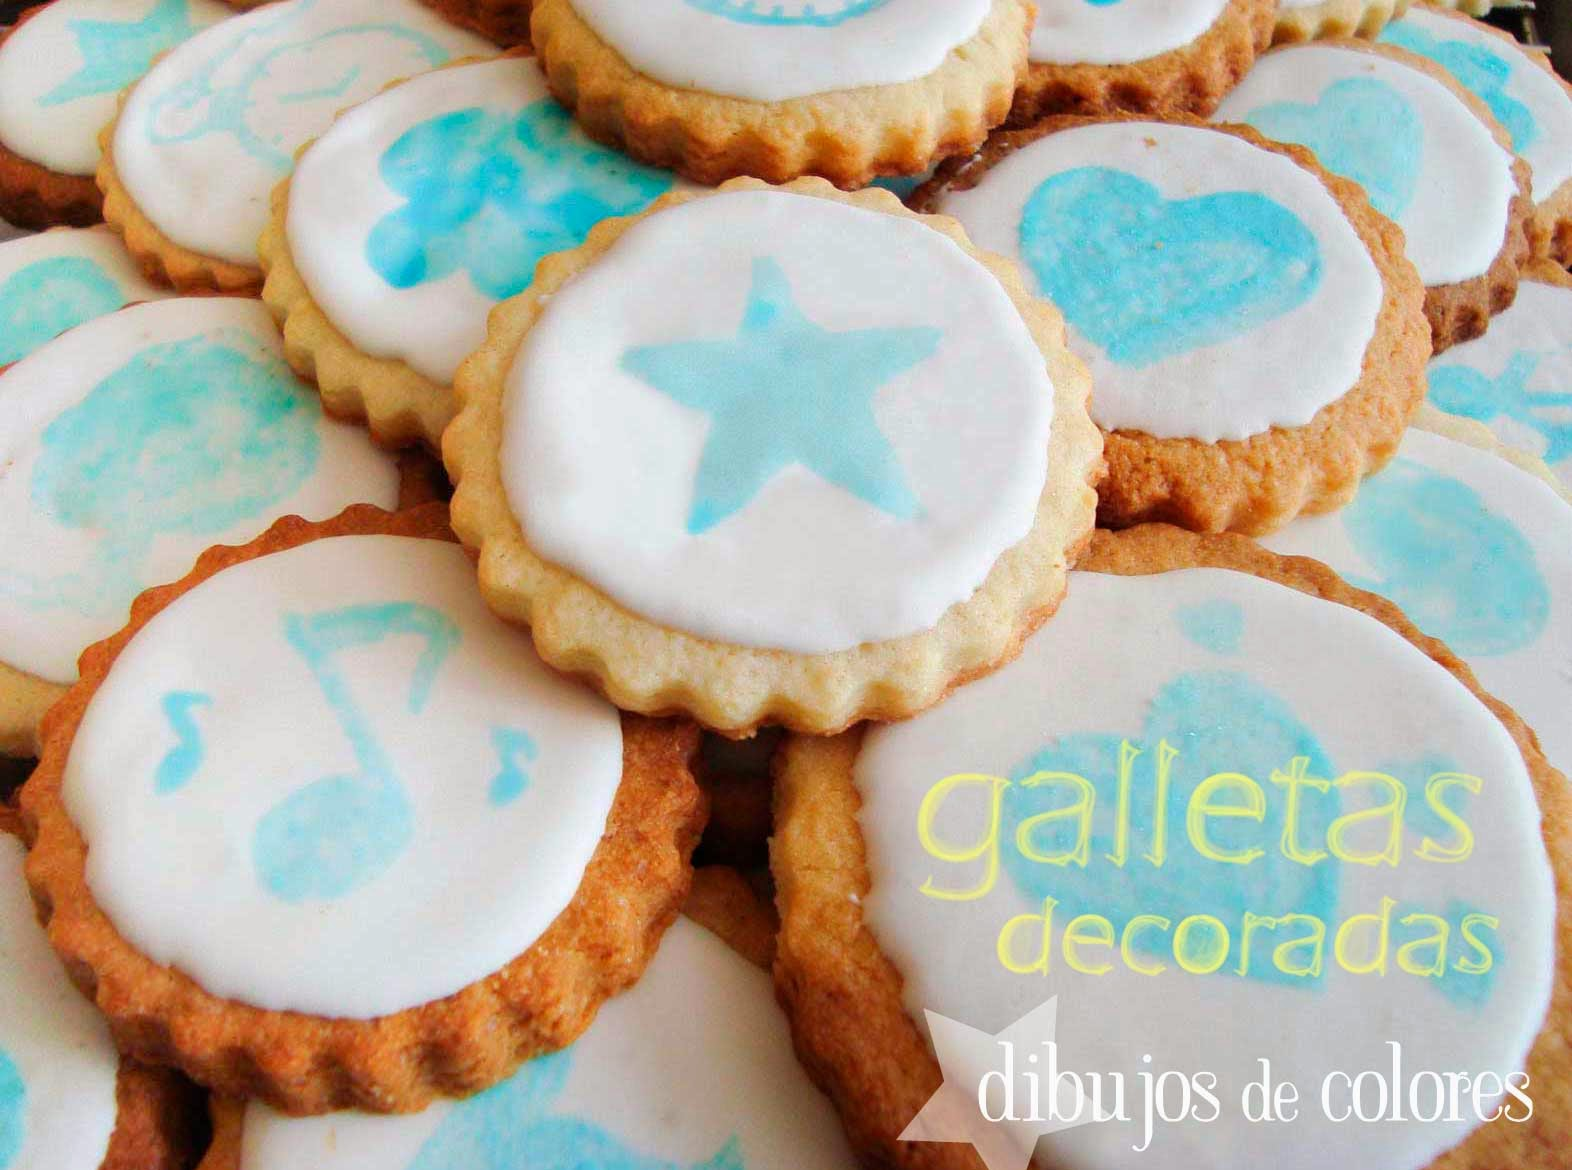 Galletas_decoradas